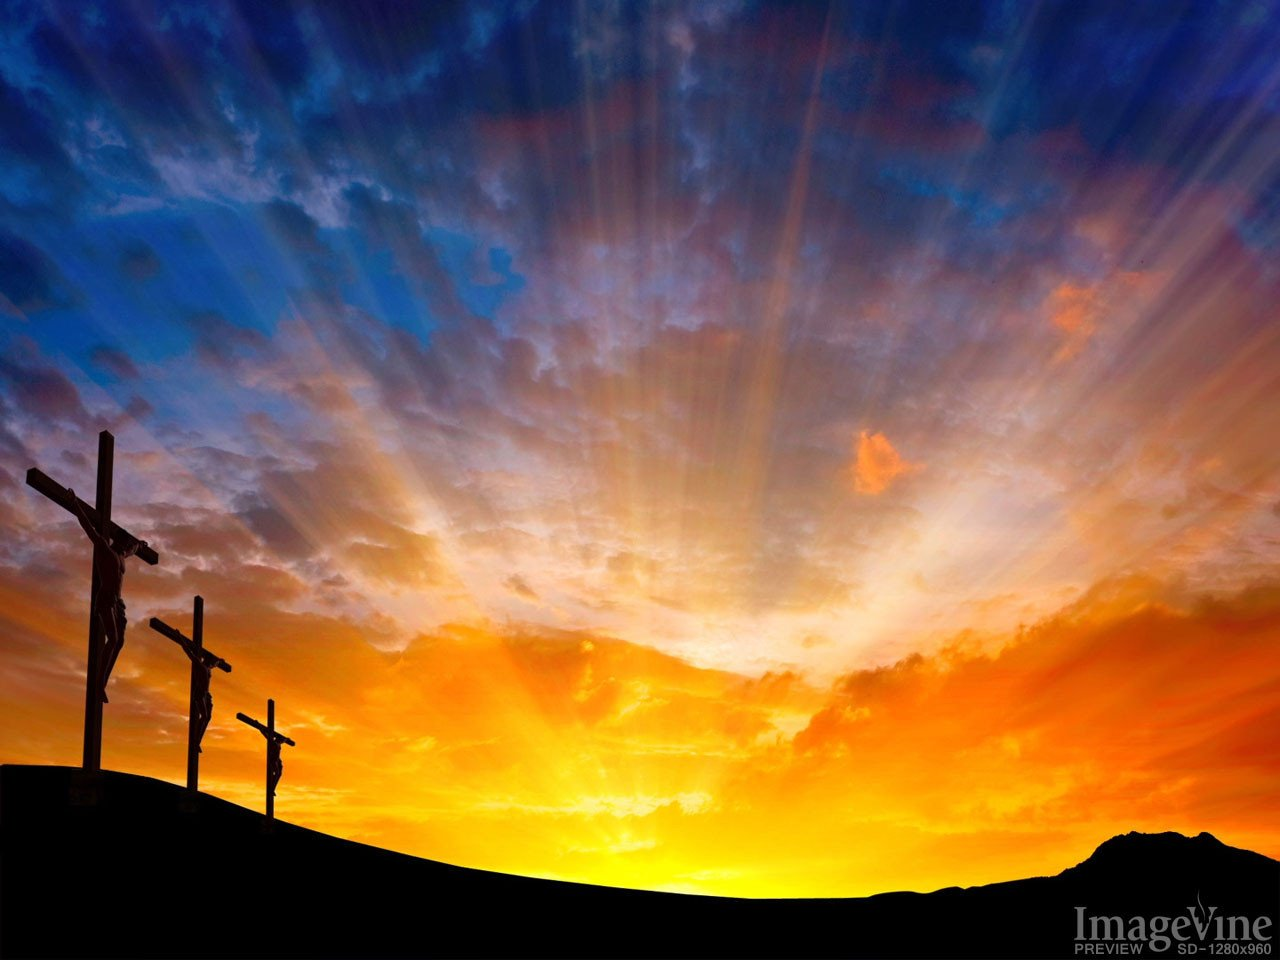 Easter Classics Backgrounds ImageVine 1280x960